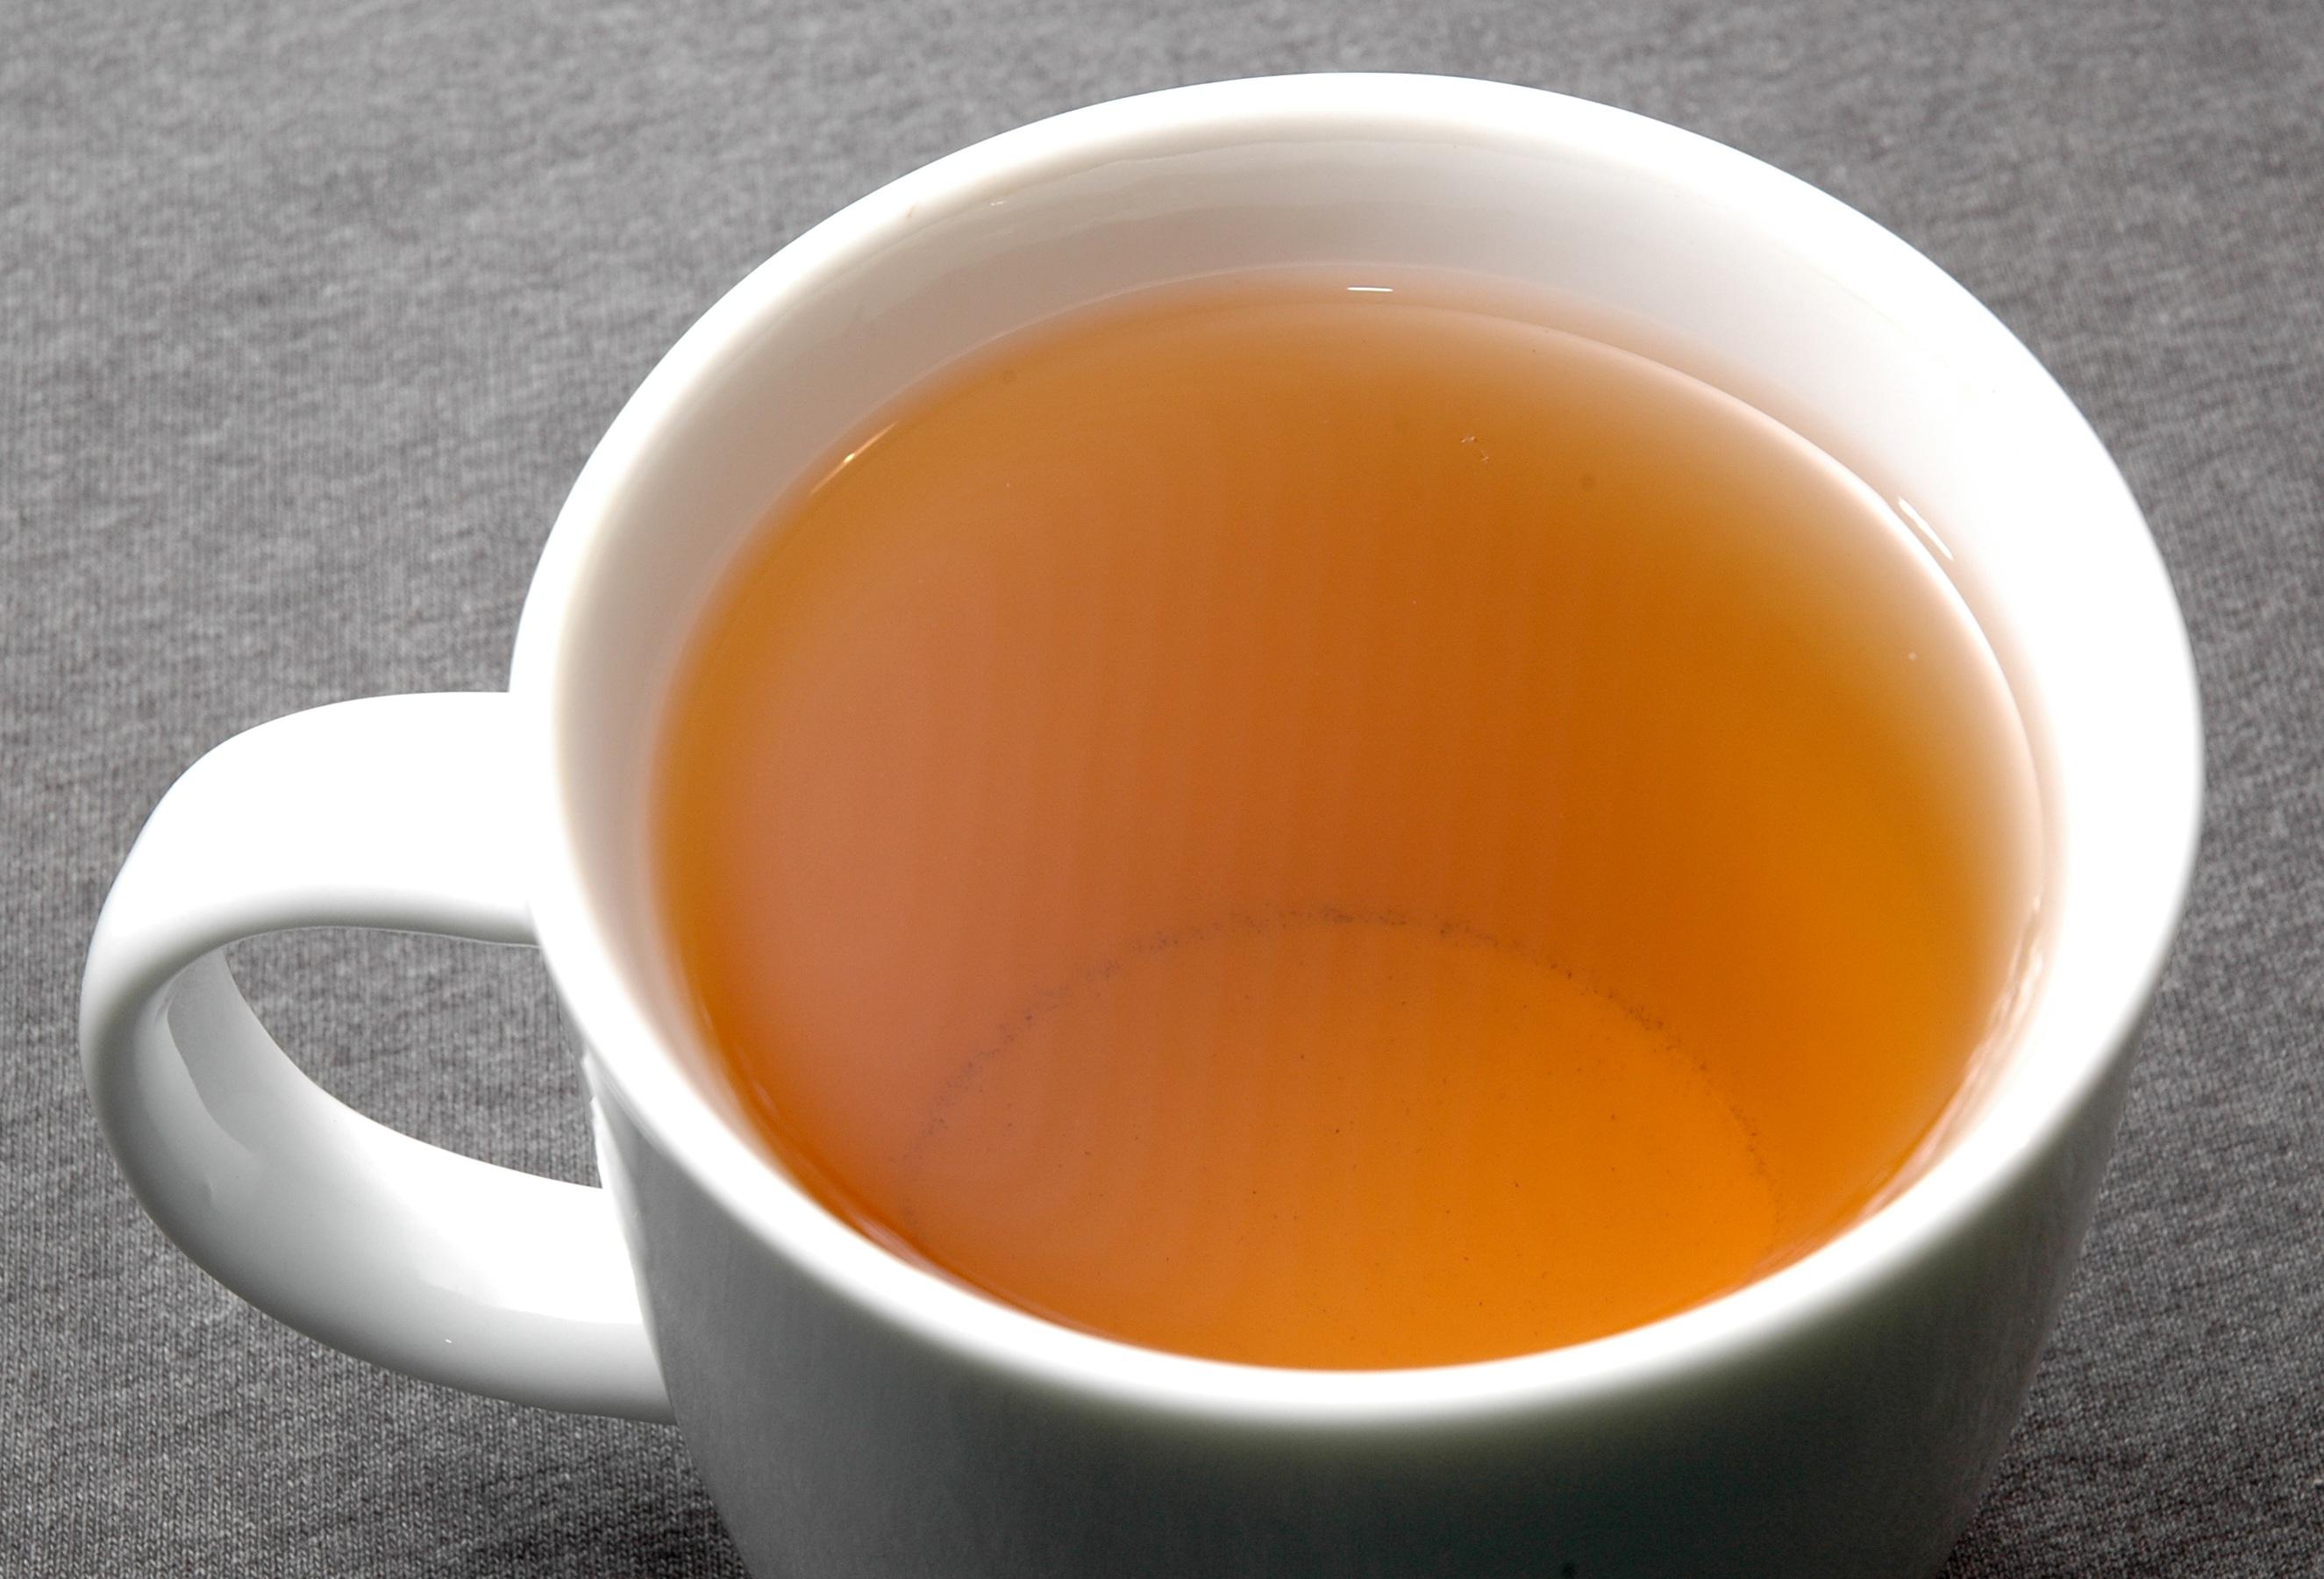 Description darjeeling tea first flush in cup